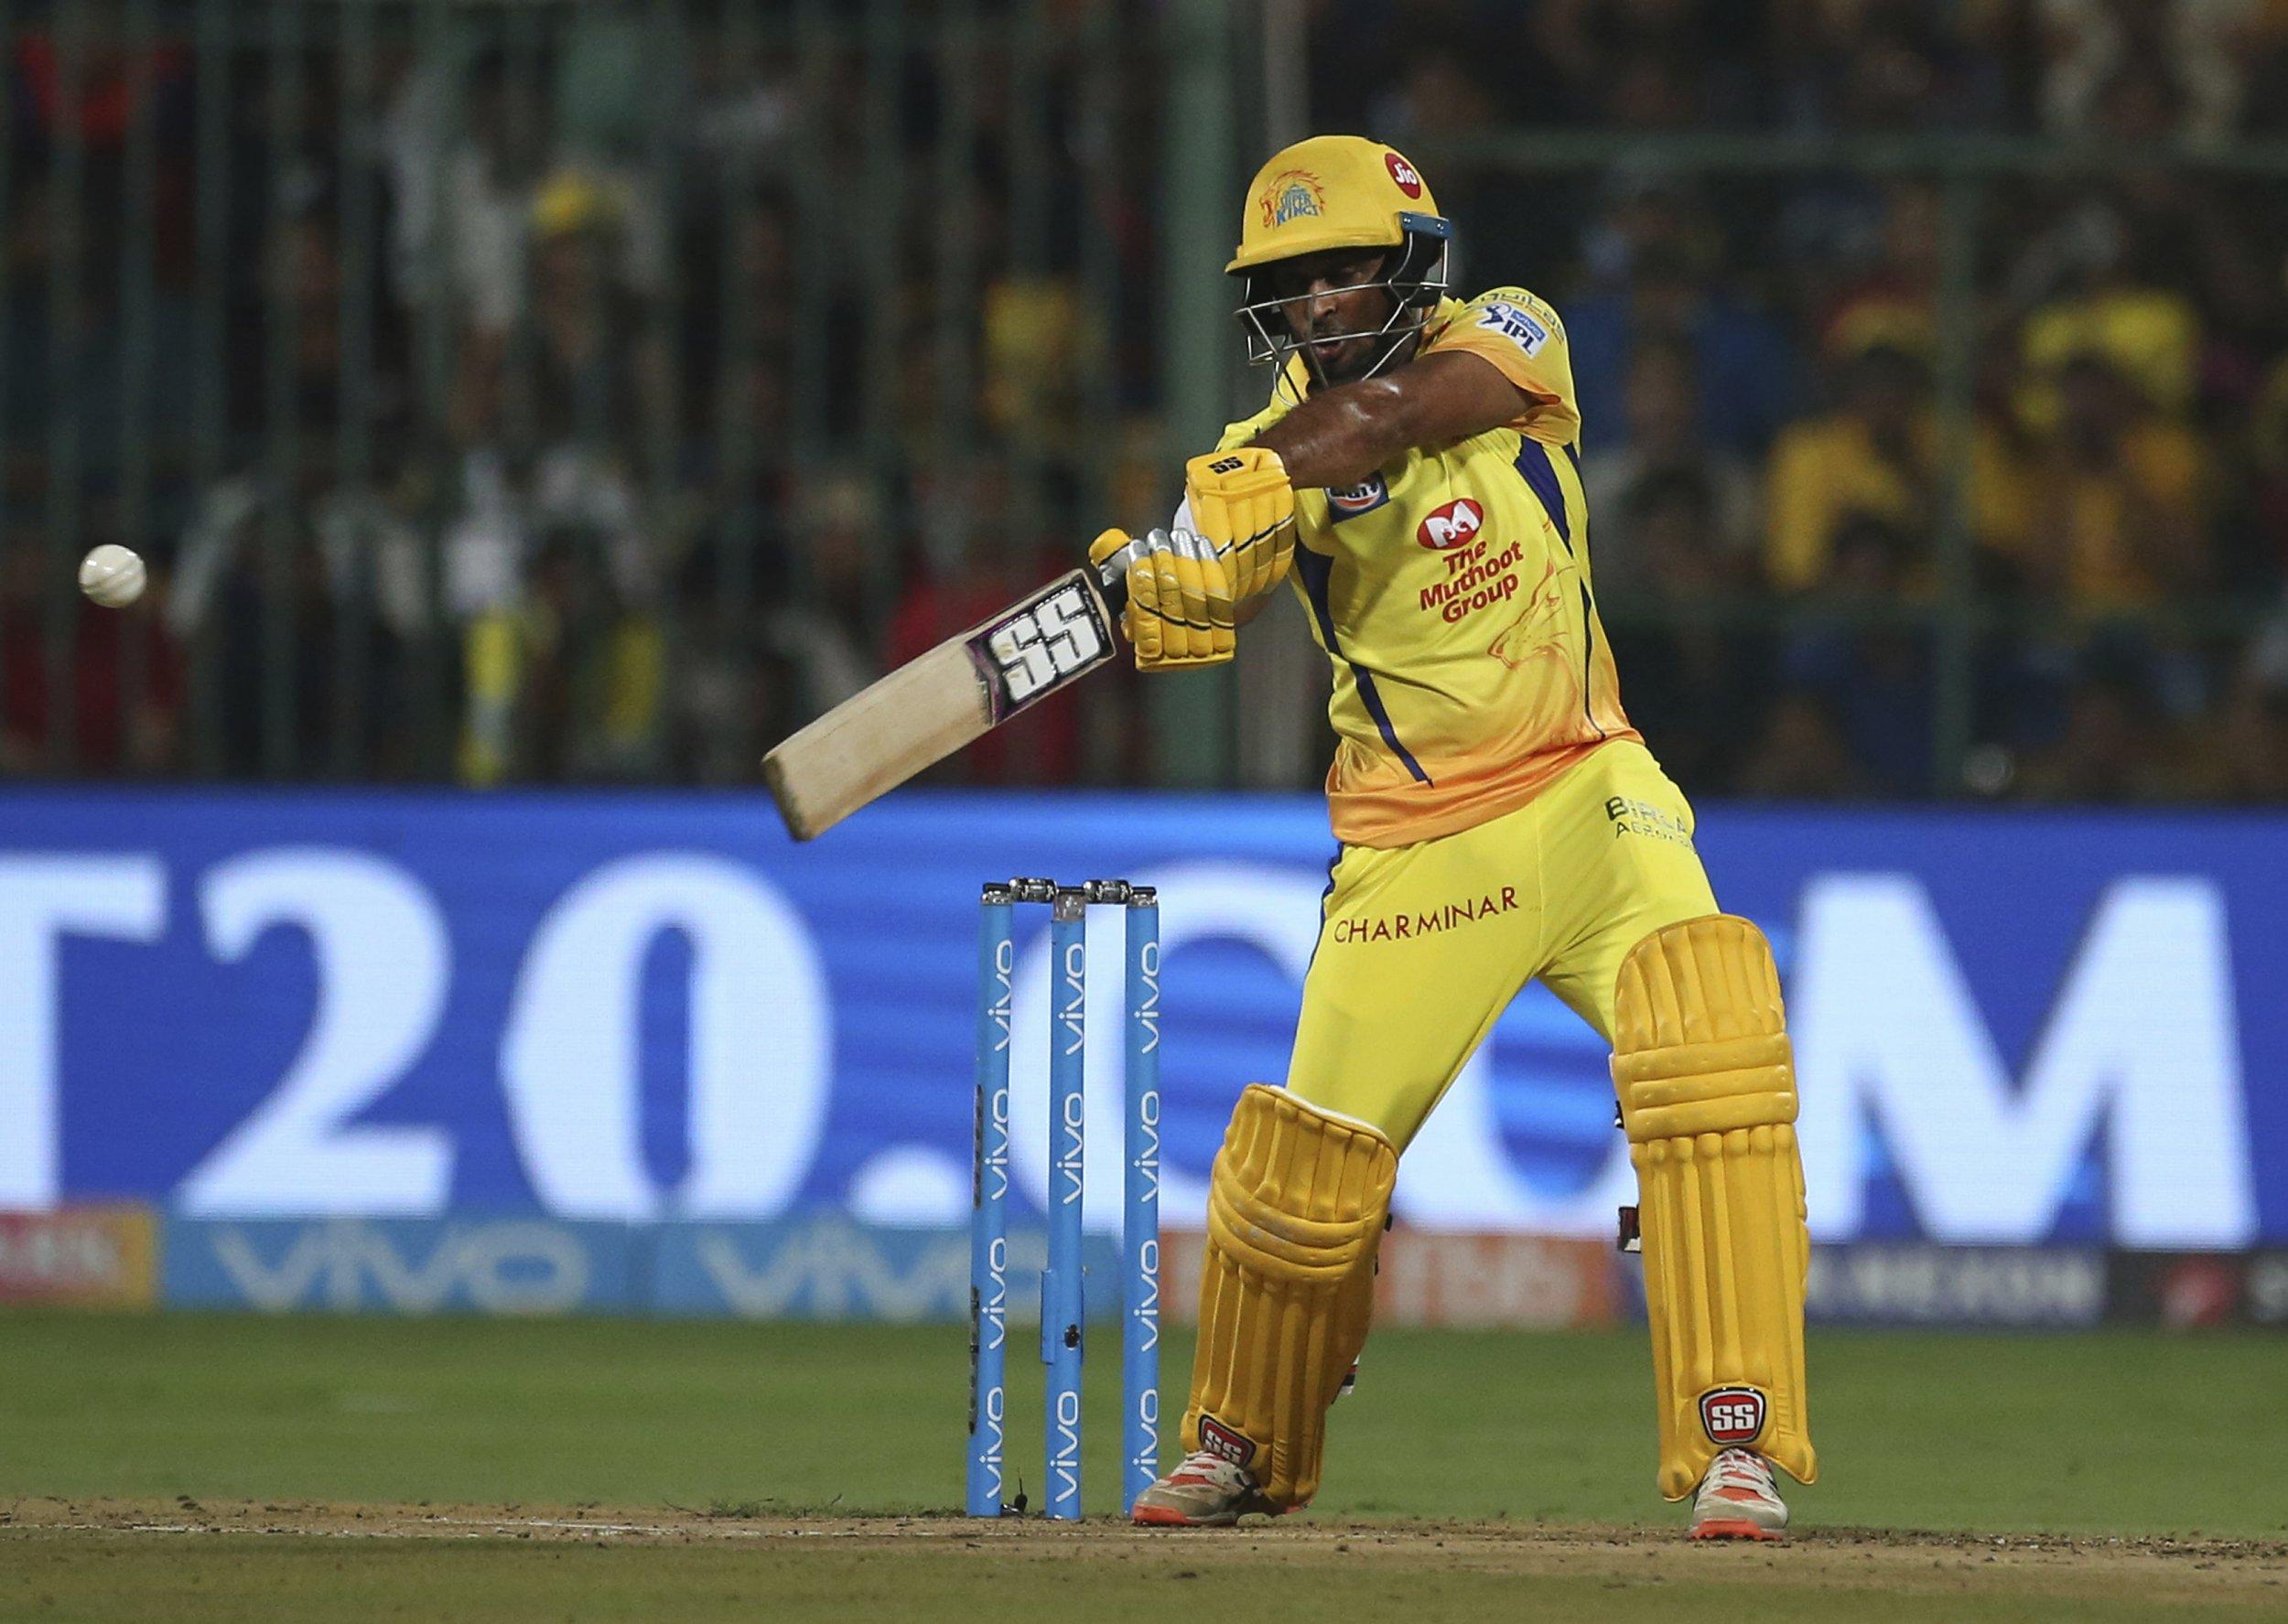 Rajasthan Royals v Chennai Super Kings betting preview: Ambati Rayudu can upstage fellow IPL veteran Shane Watson